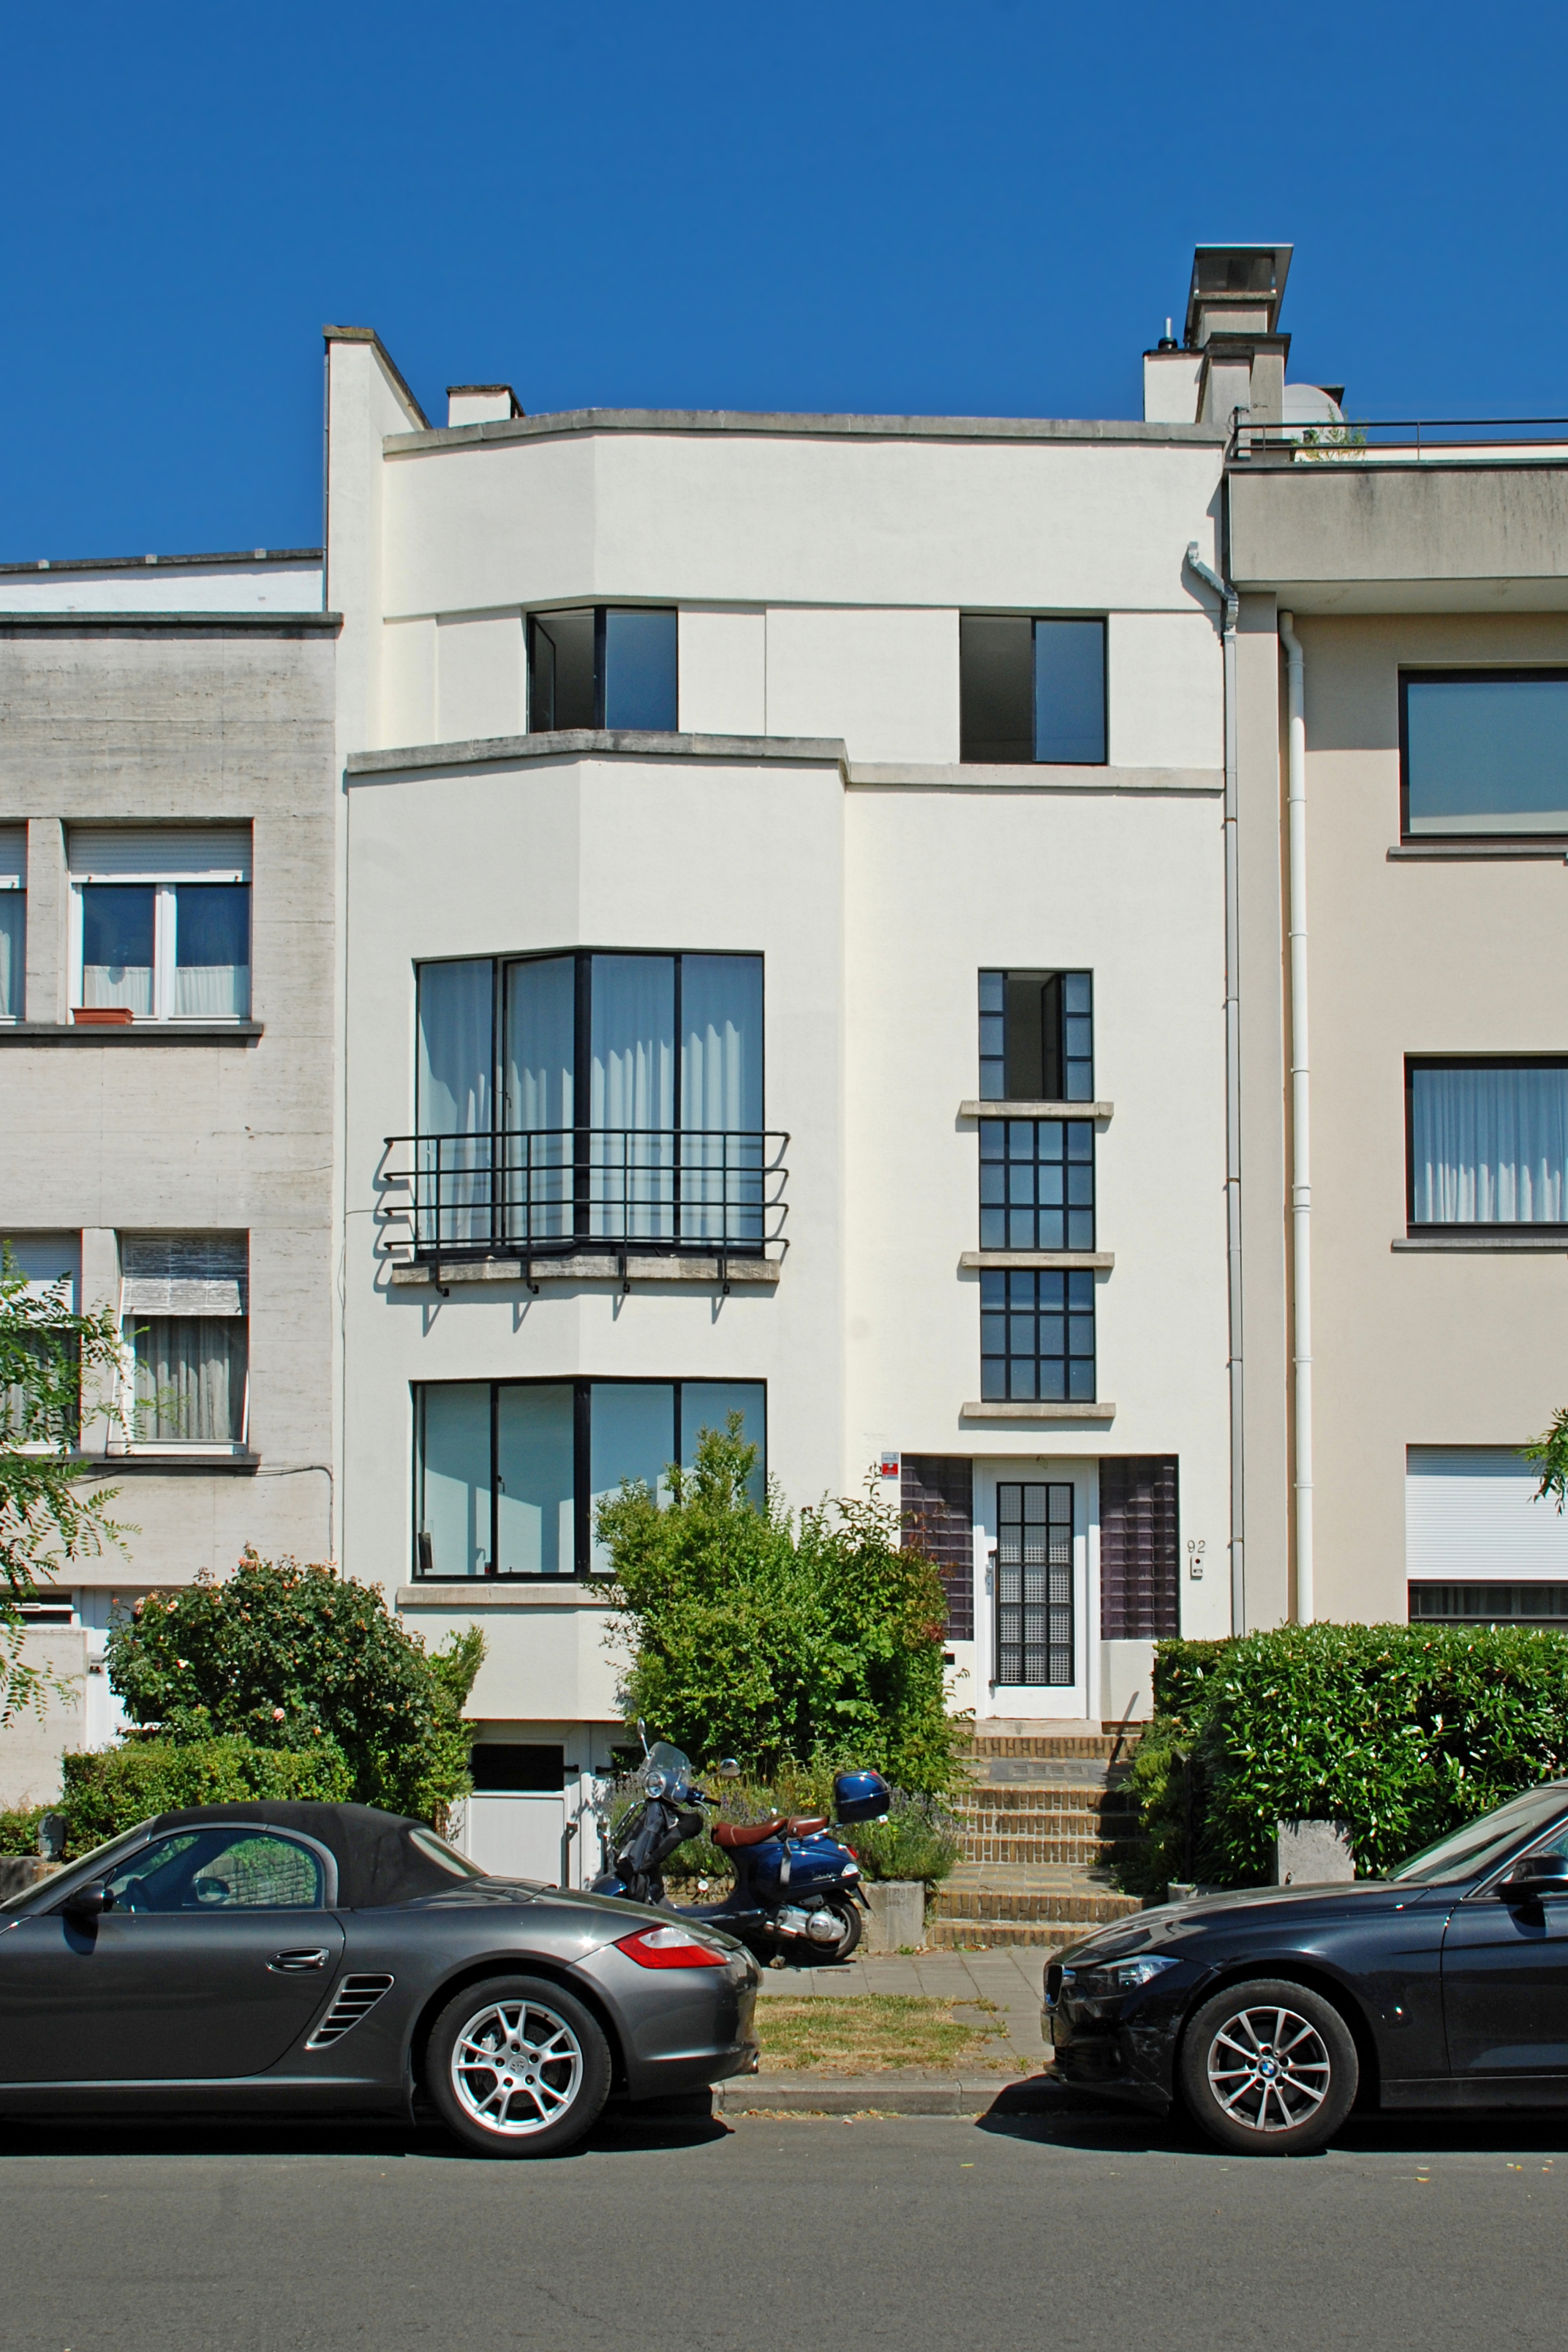 File:Belgique - Bruxelles - Maison Borin - 02.jpg - Wikimedia Commons